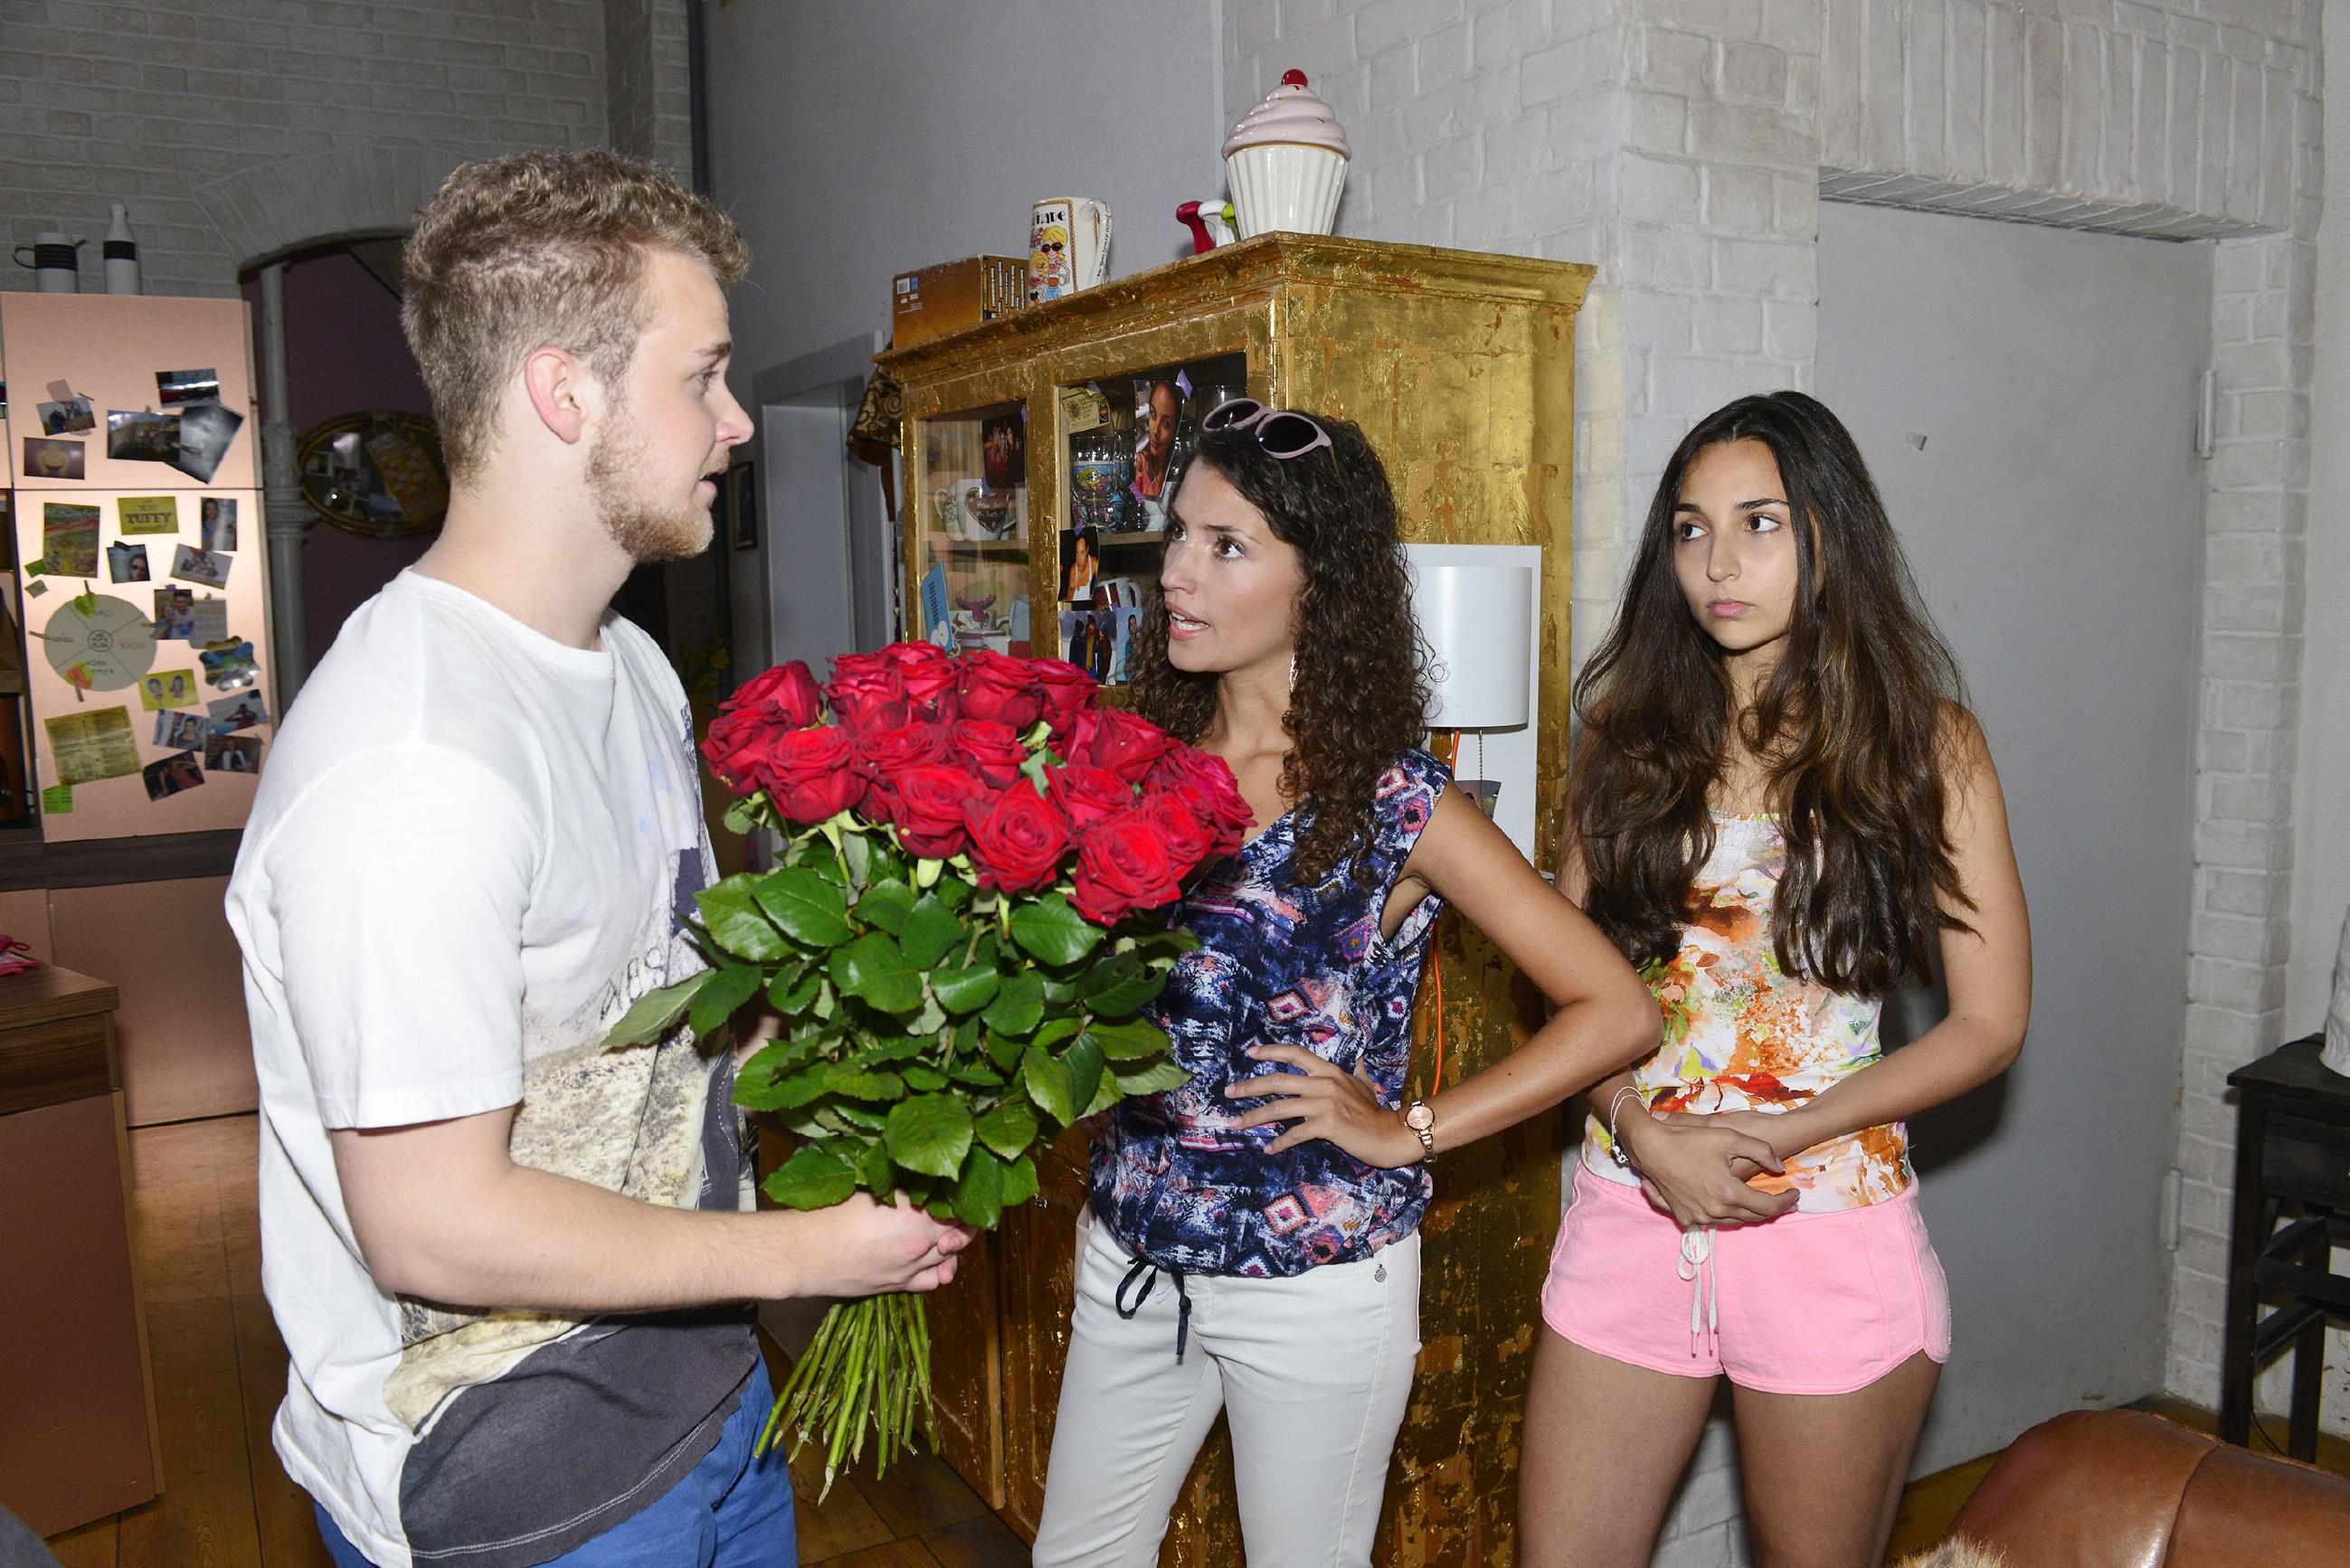 Als Jonas (Felix van Deventer) plötzlich mit Blumen aufkreuzt, erfährt Ayla (Nadine Menz, M.) entsetzt, dass Jonas Selma (Rona Özkan) betrogen hat... (Quelle: RTL / Rolf Baumgartner)